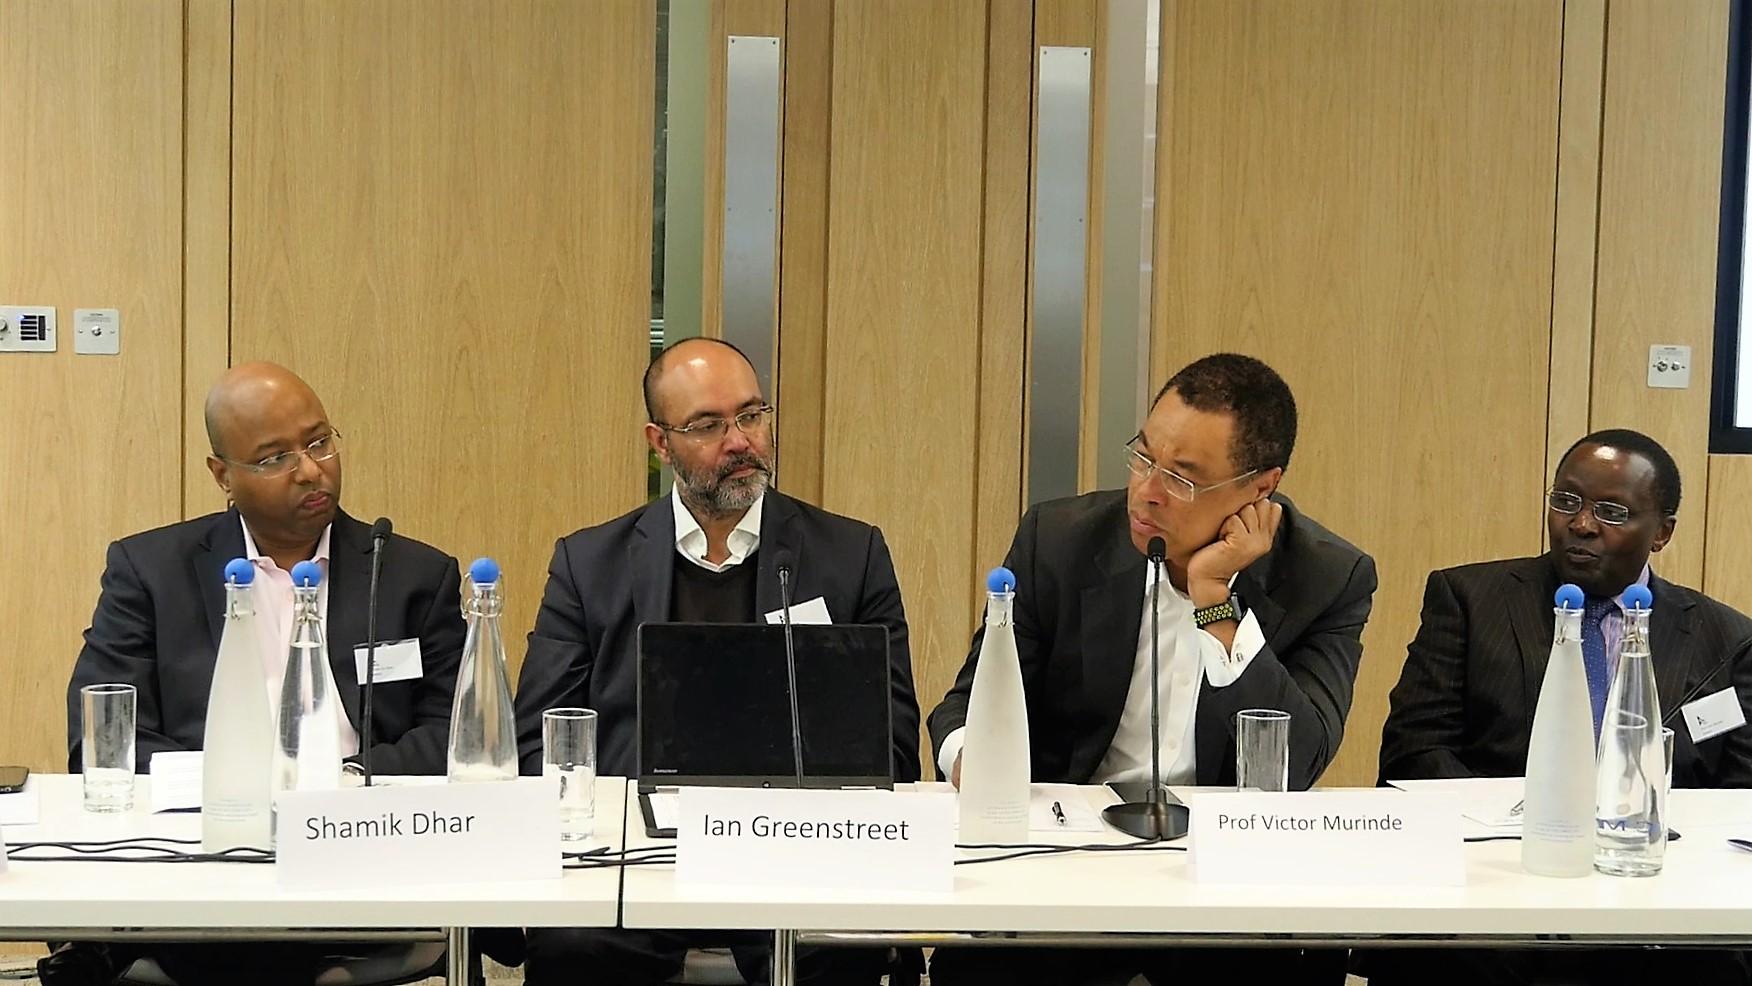 (l:r) Shamik Dhar, Ian Greenstreet, Prof. Victor Murinde